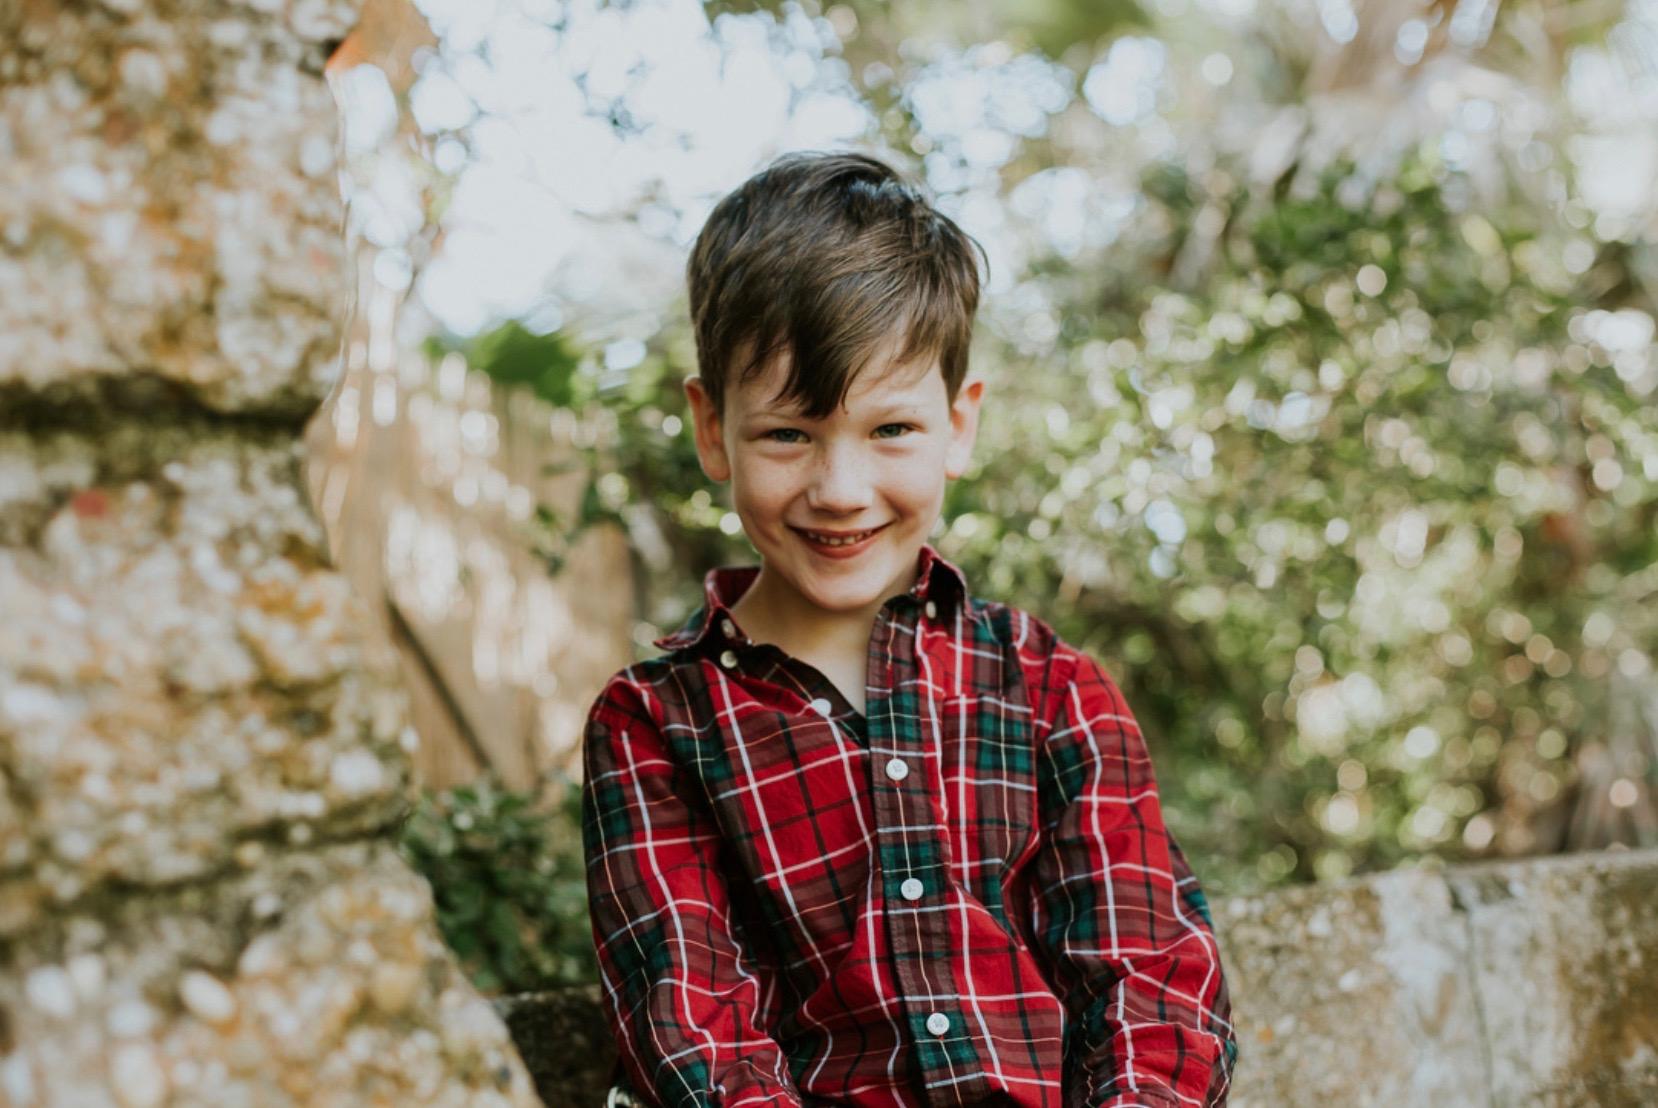 Brandi Image Photography   Featherston-Resch Family 2018-08-09 12-50-06.jpg